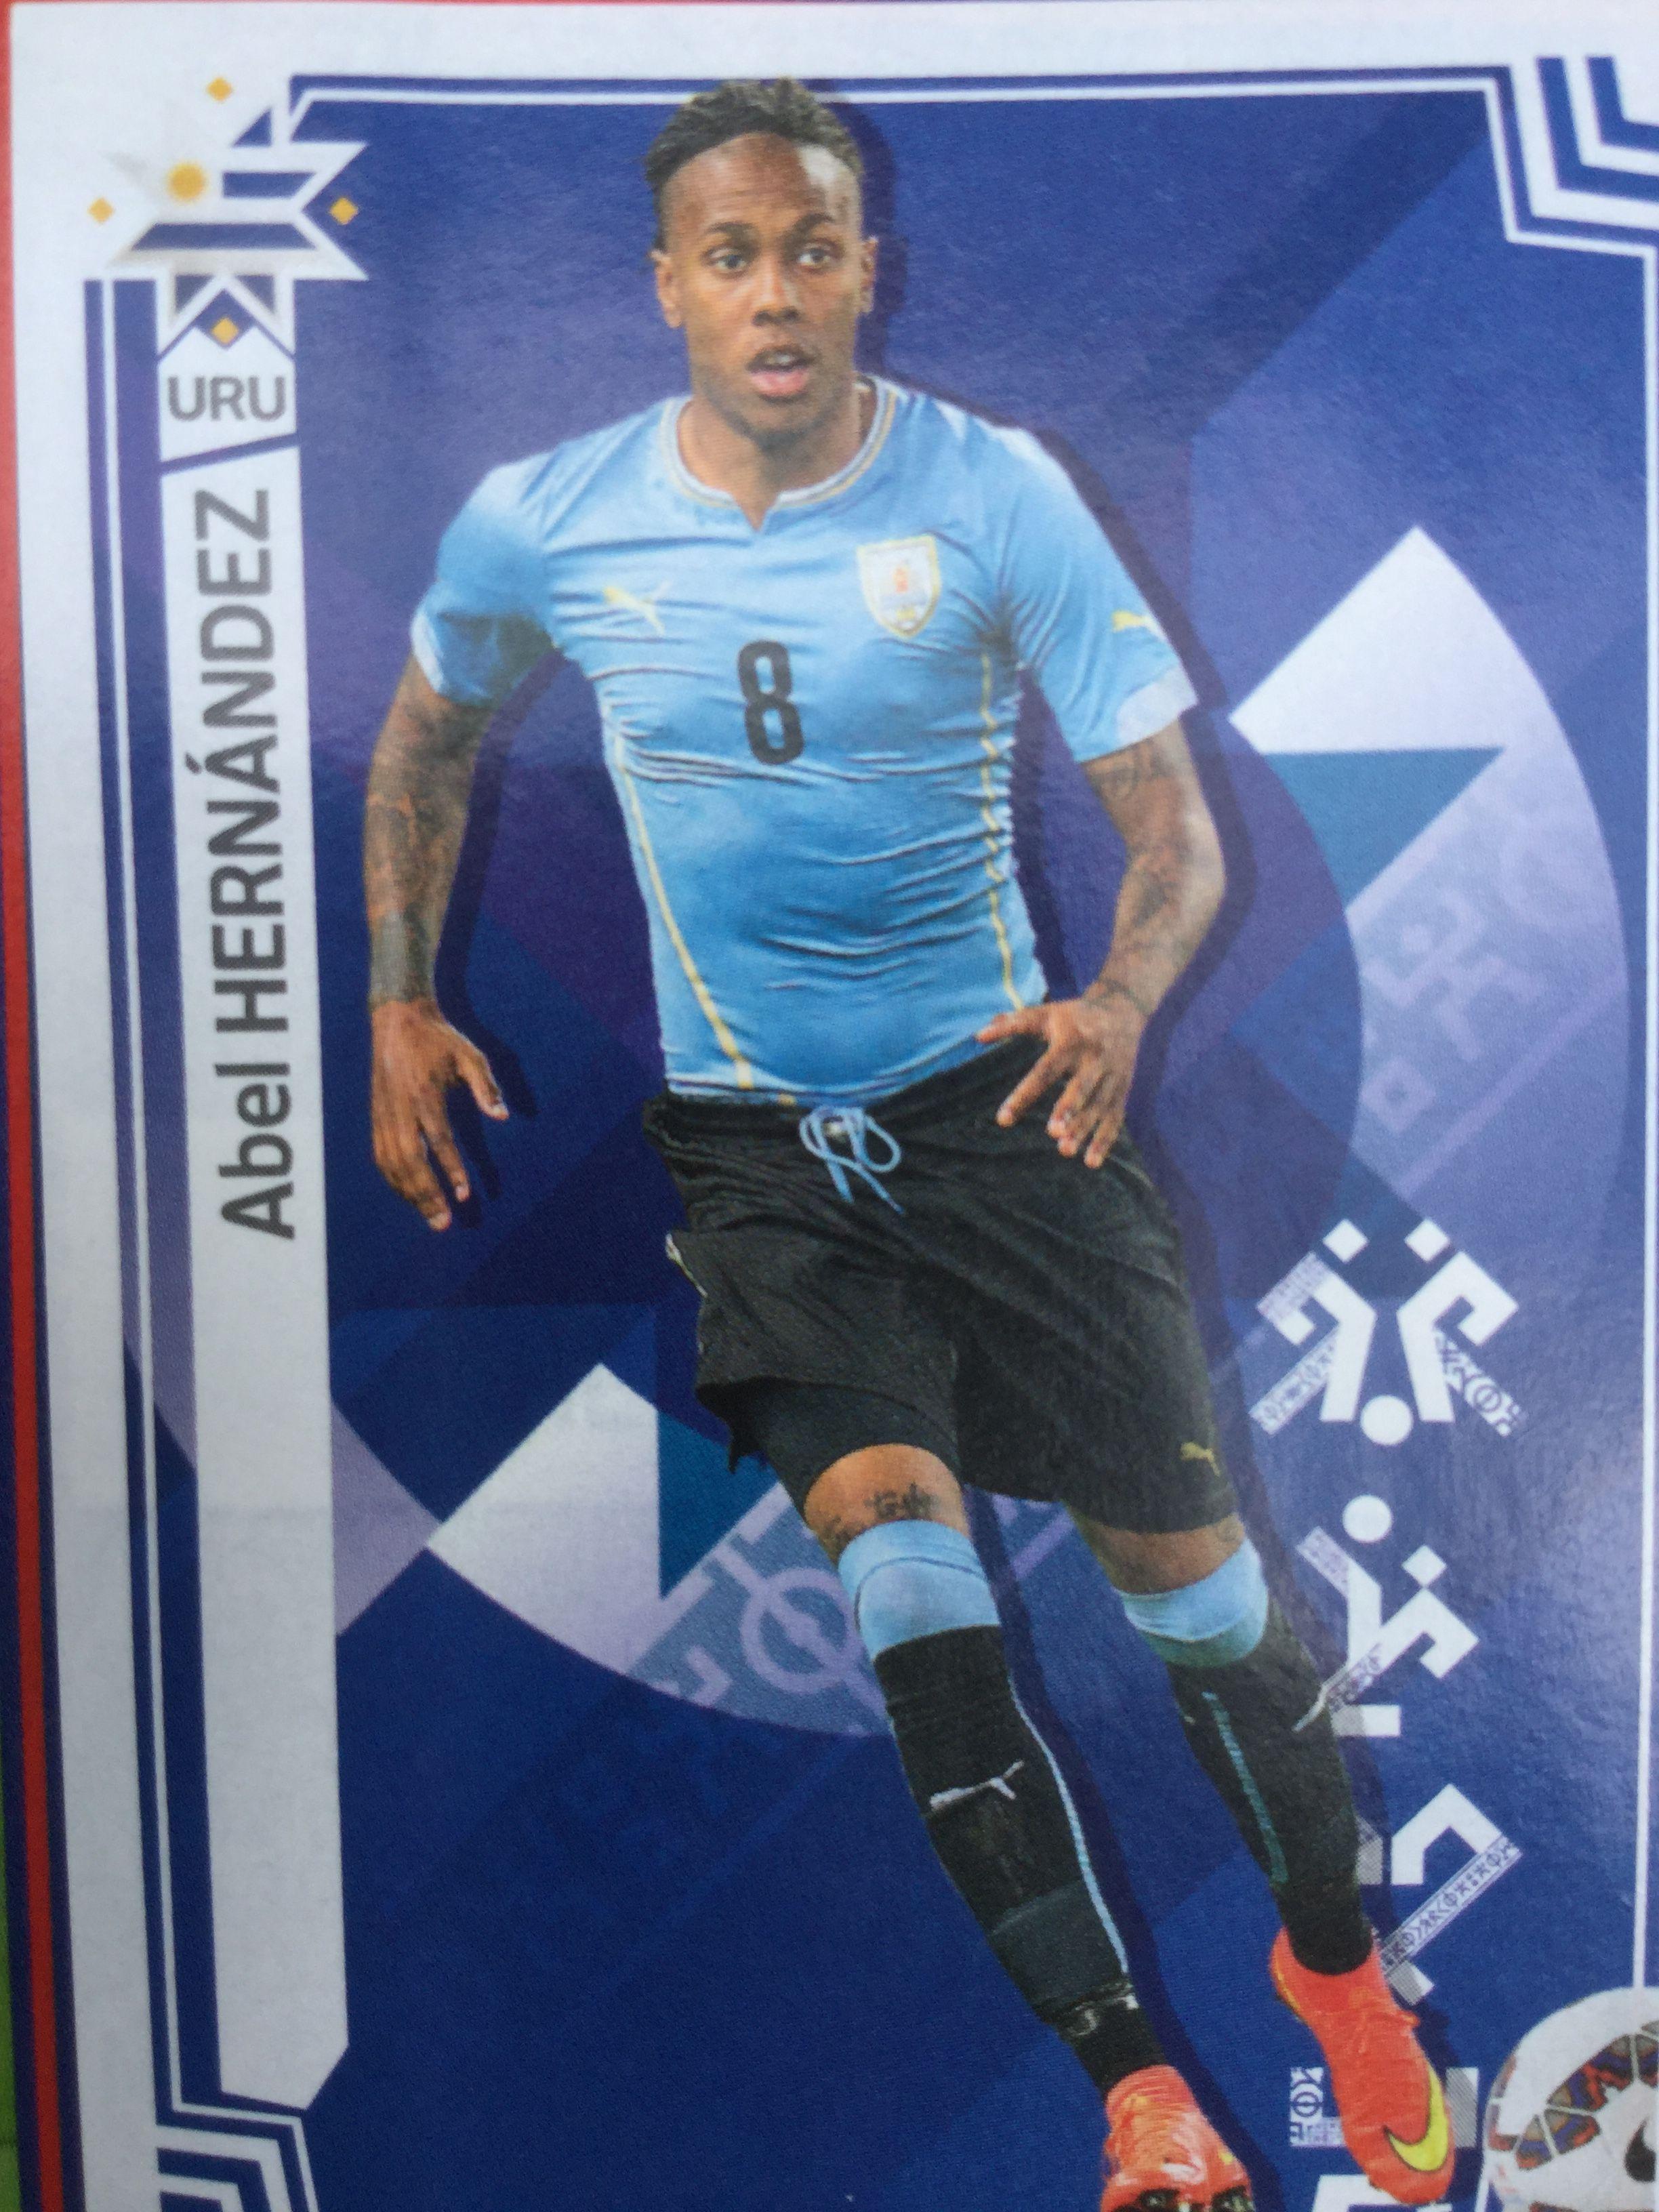 Copa America 2015 Sporty